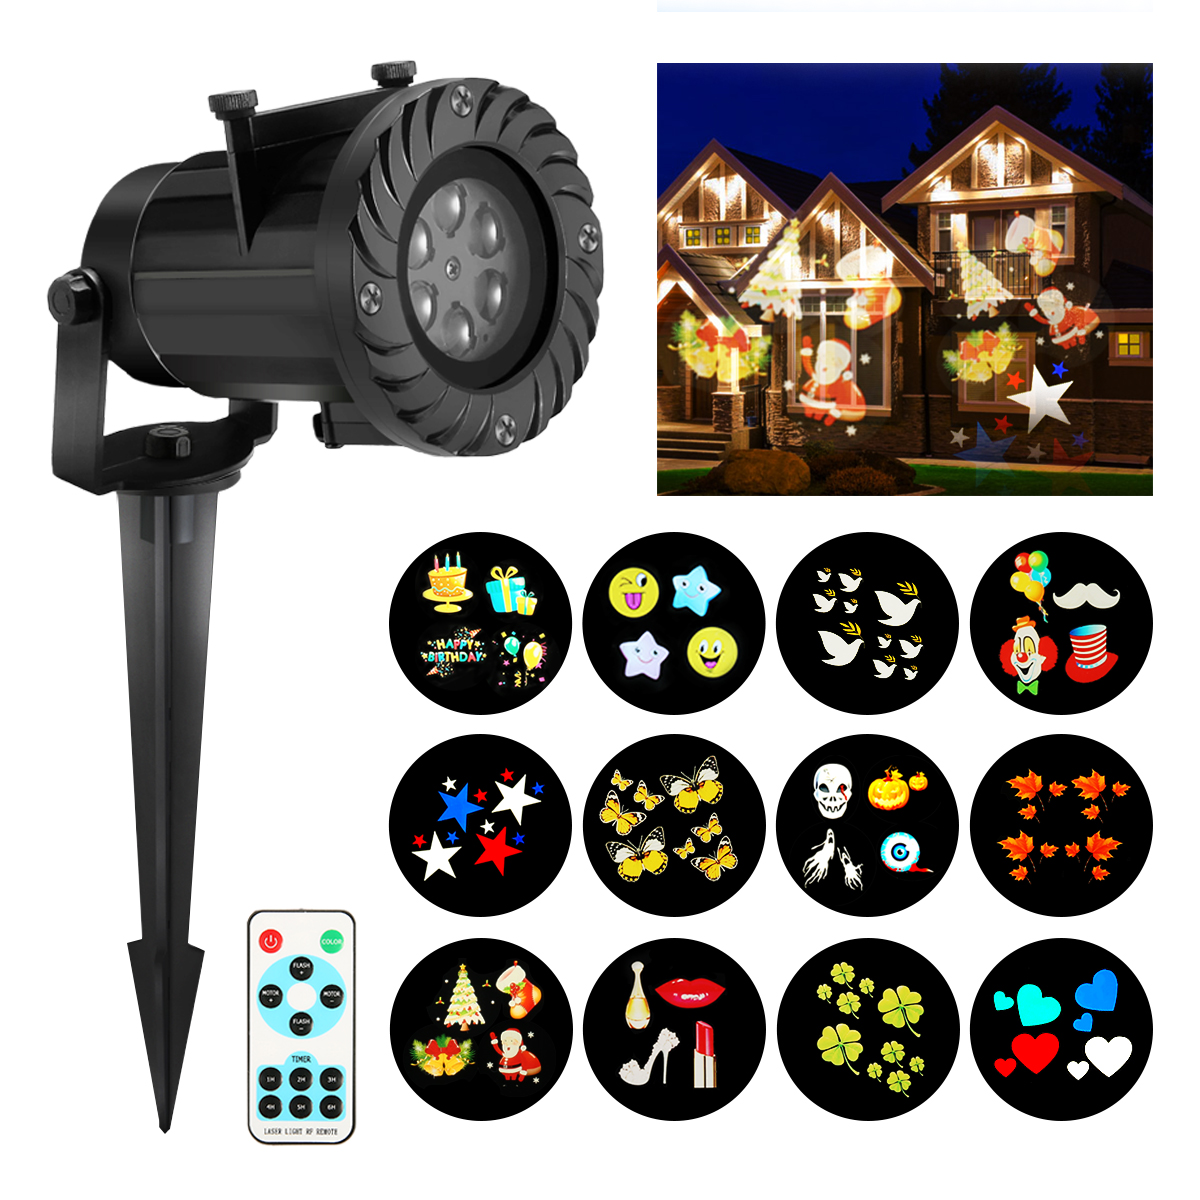 Christmas projector lights camtoa 12 pattern led light projector star shower projector light for Star shower projecteur